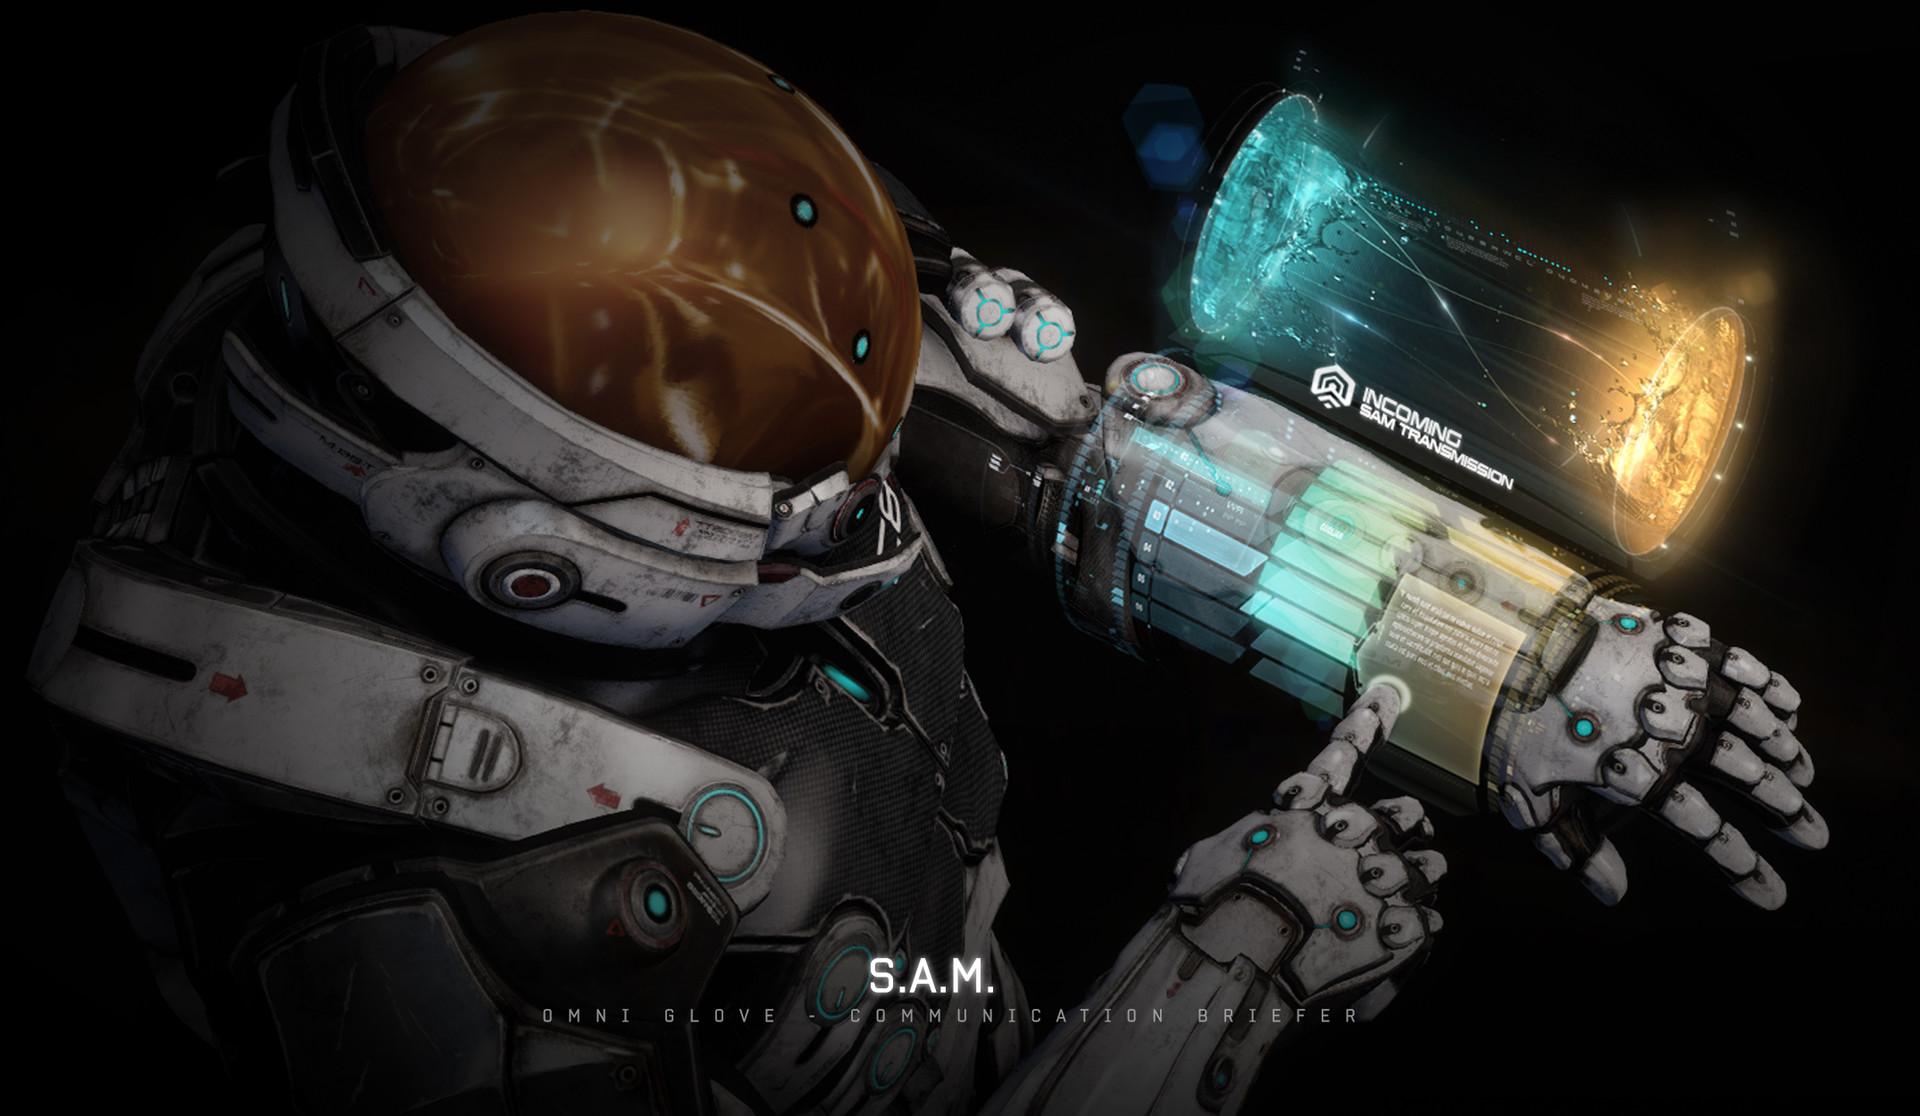 Mass Effect Andromeda Official Concept Art Shows Cut